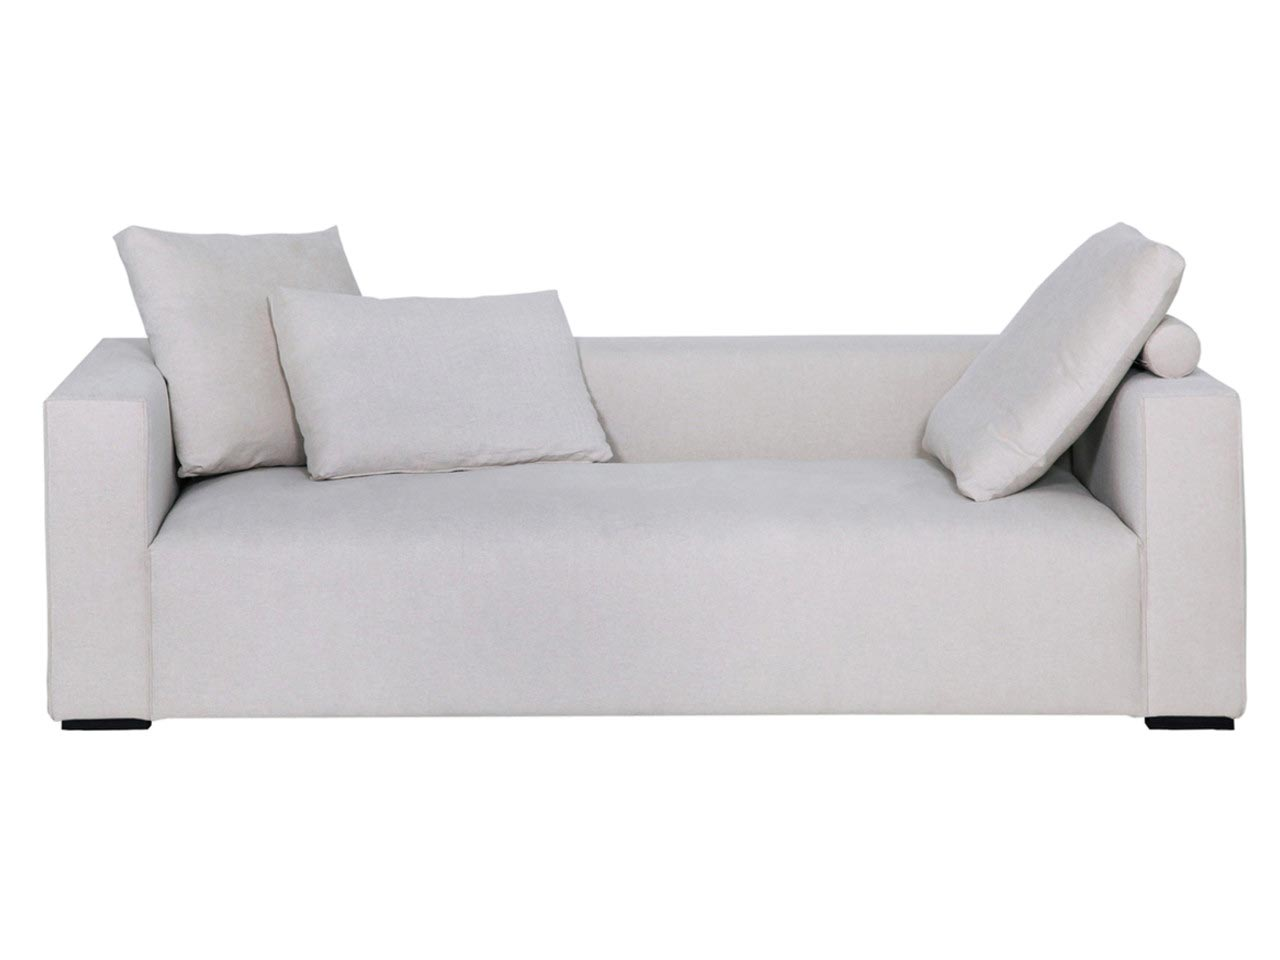 canap composable riva eggenberger meubles sa lausanne. Black Bedroom Furniture Sets. Home Design Ideas